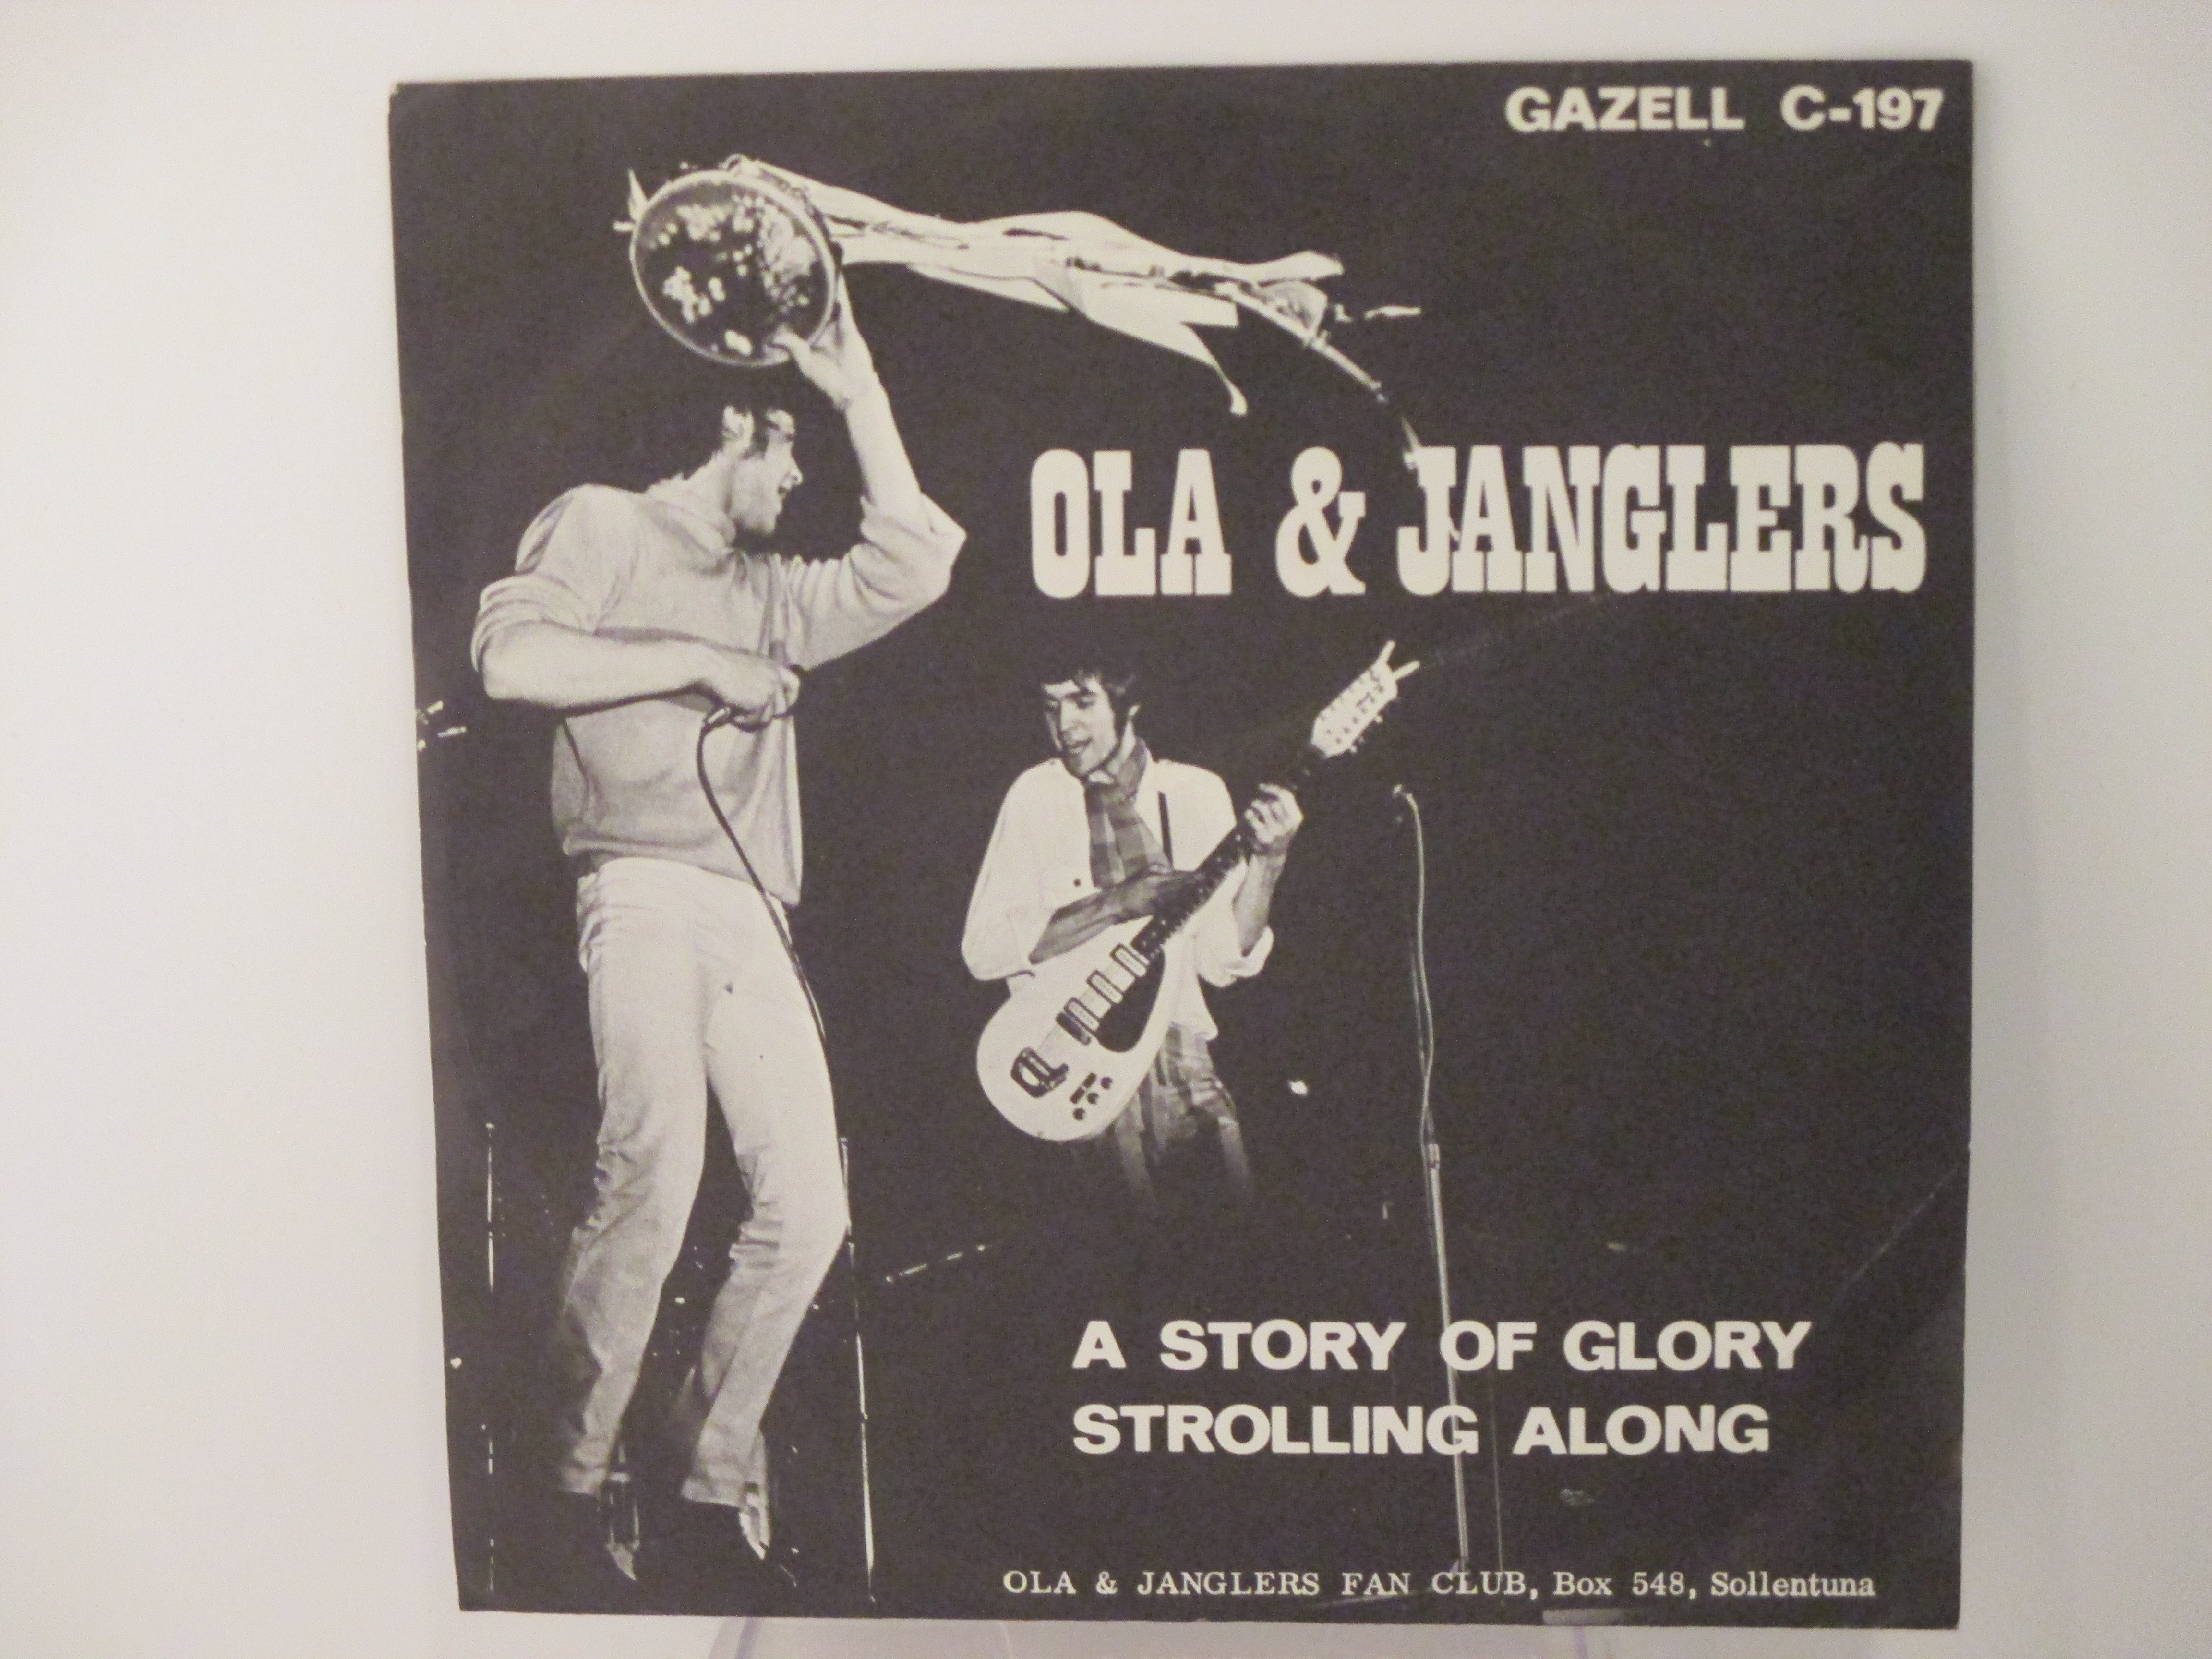 OLA & JANGLERS : Strolling along / A story of glory